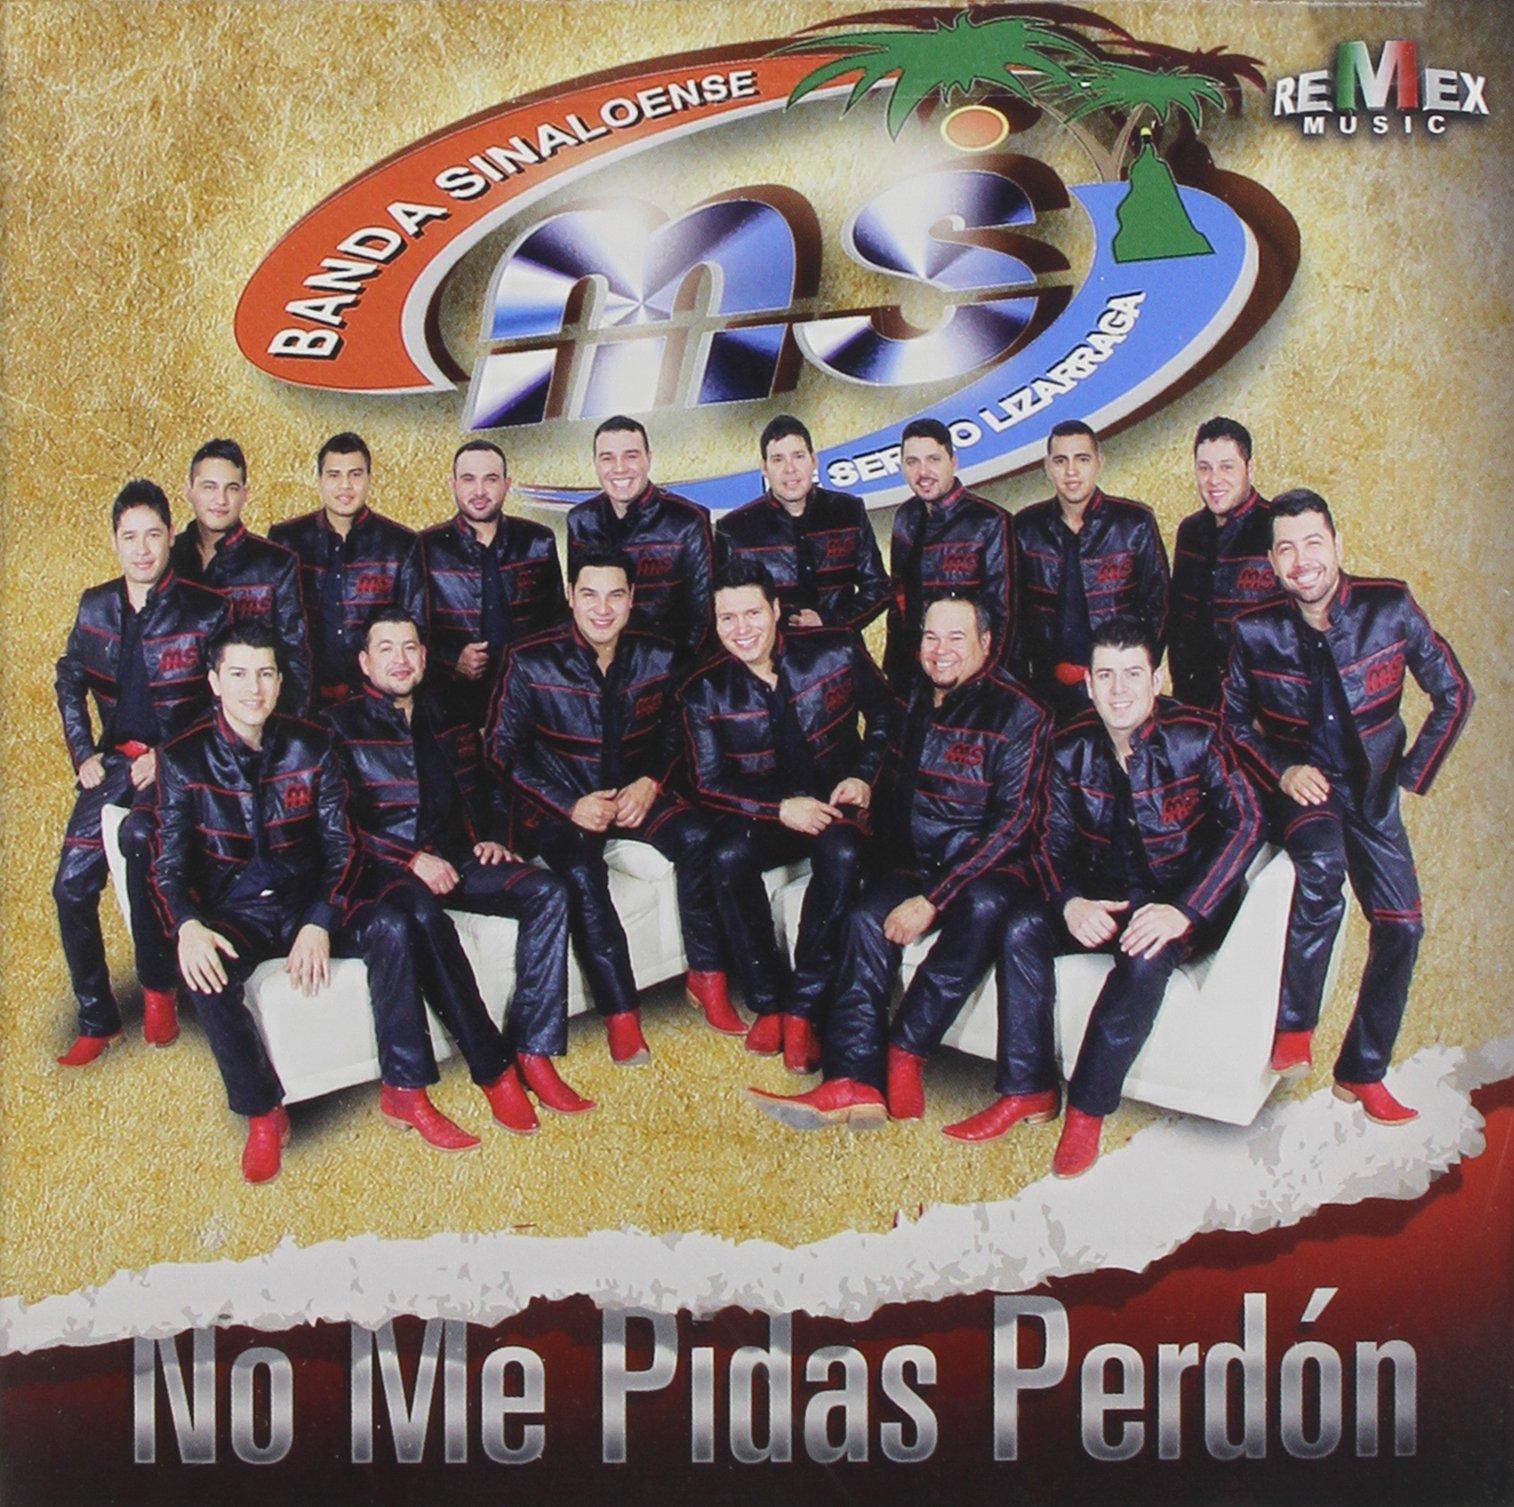 CD : Banda Sinaloense MS de Sergio Lizarraga - No Me Pidas Perdon (CD)